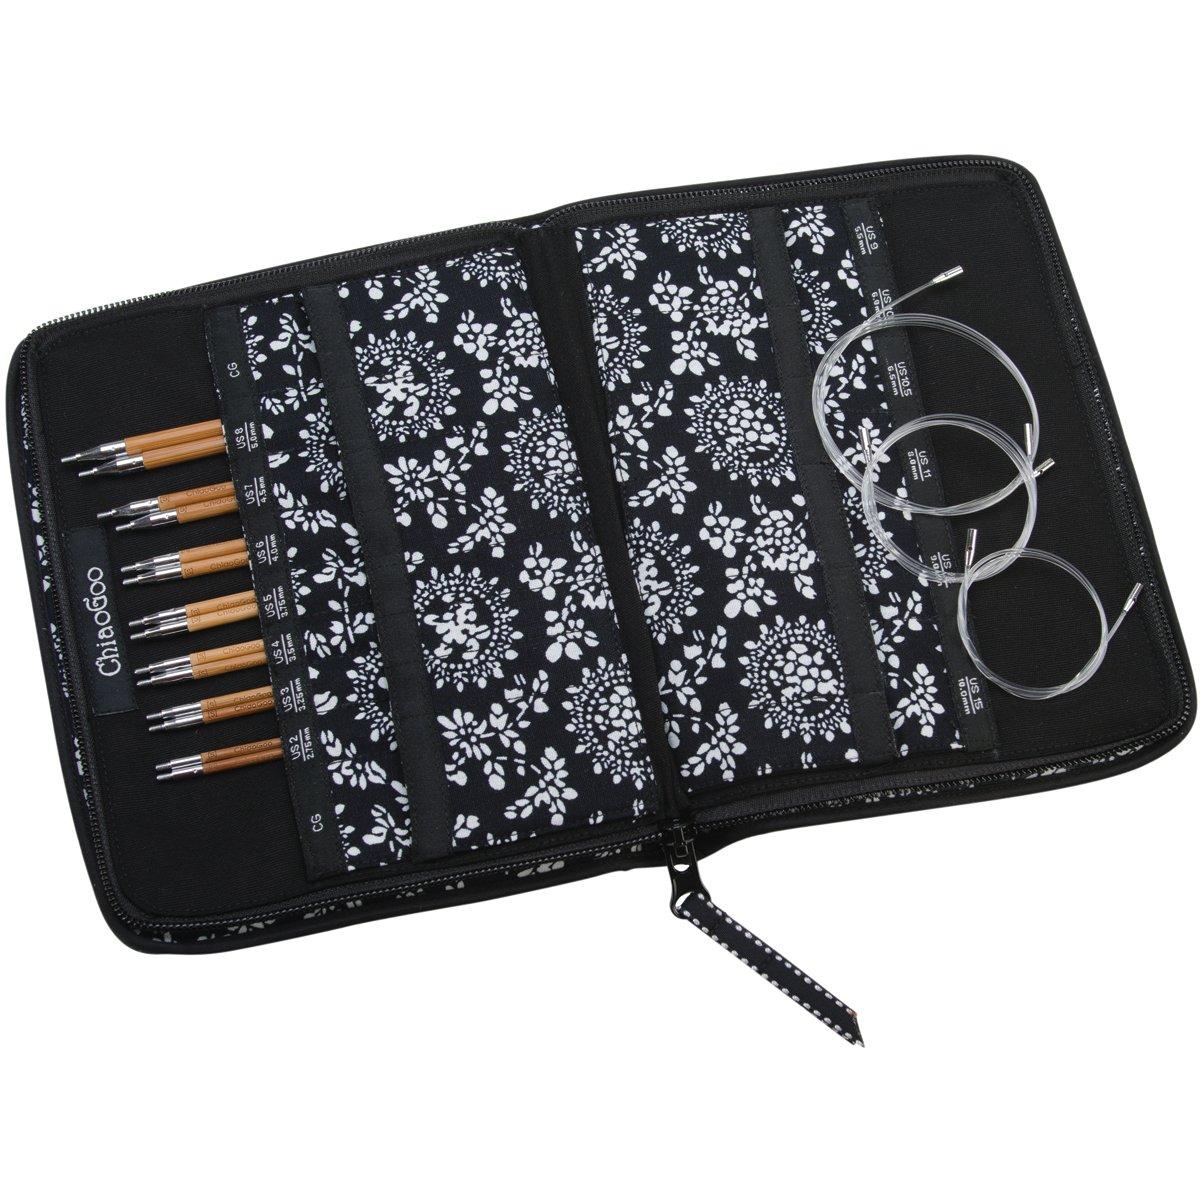 ChiaoGoo 2500-S Spin Interchangeable Knitting Needle Set, Small